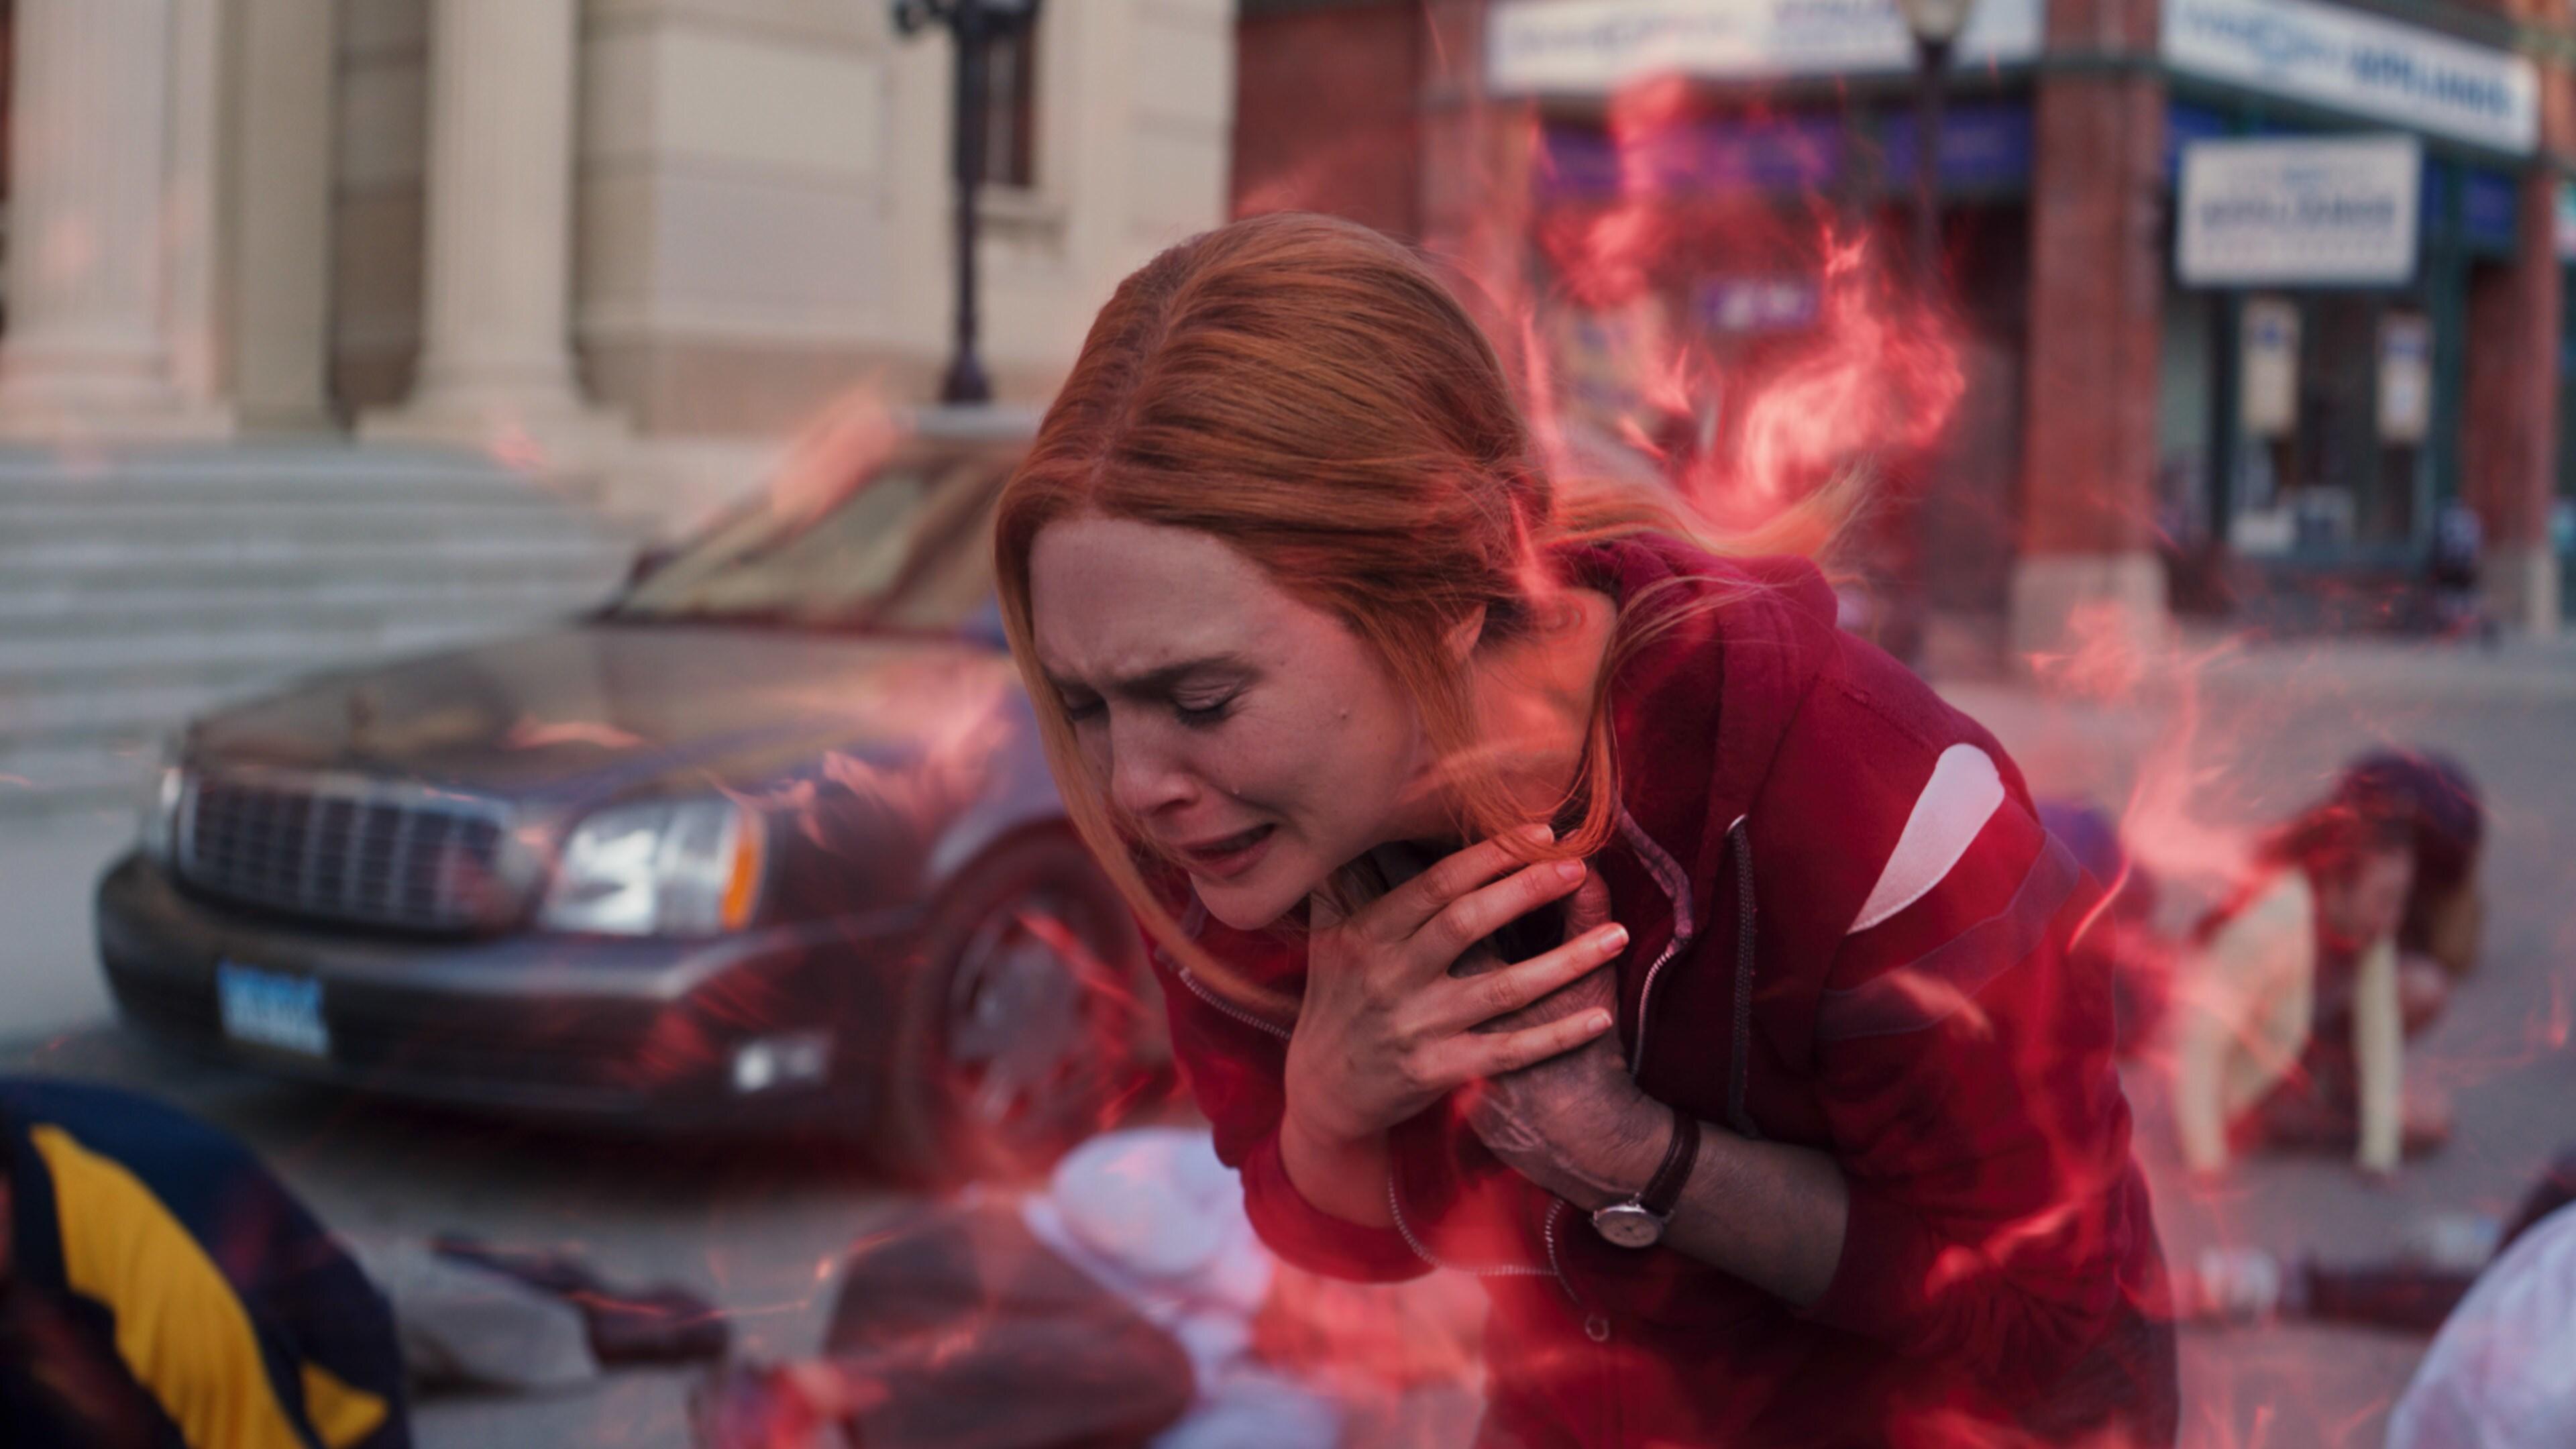 Elizabeth Olsen as Wanda Maximoff in Marvel Studios' WANDAVISION exclusively on Disney+. Photo courtesy of Marvel Studios. ©Marvel Studios 2021. All Rights Reserved.